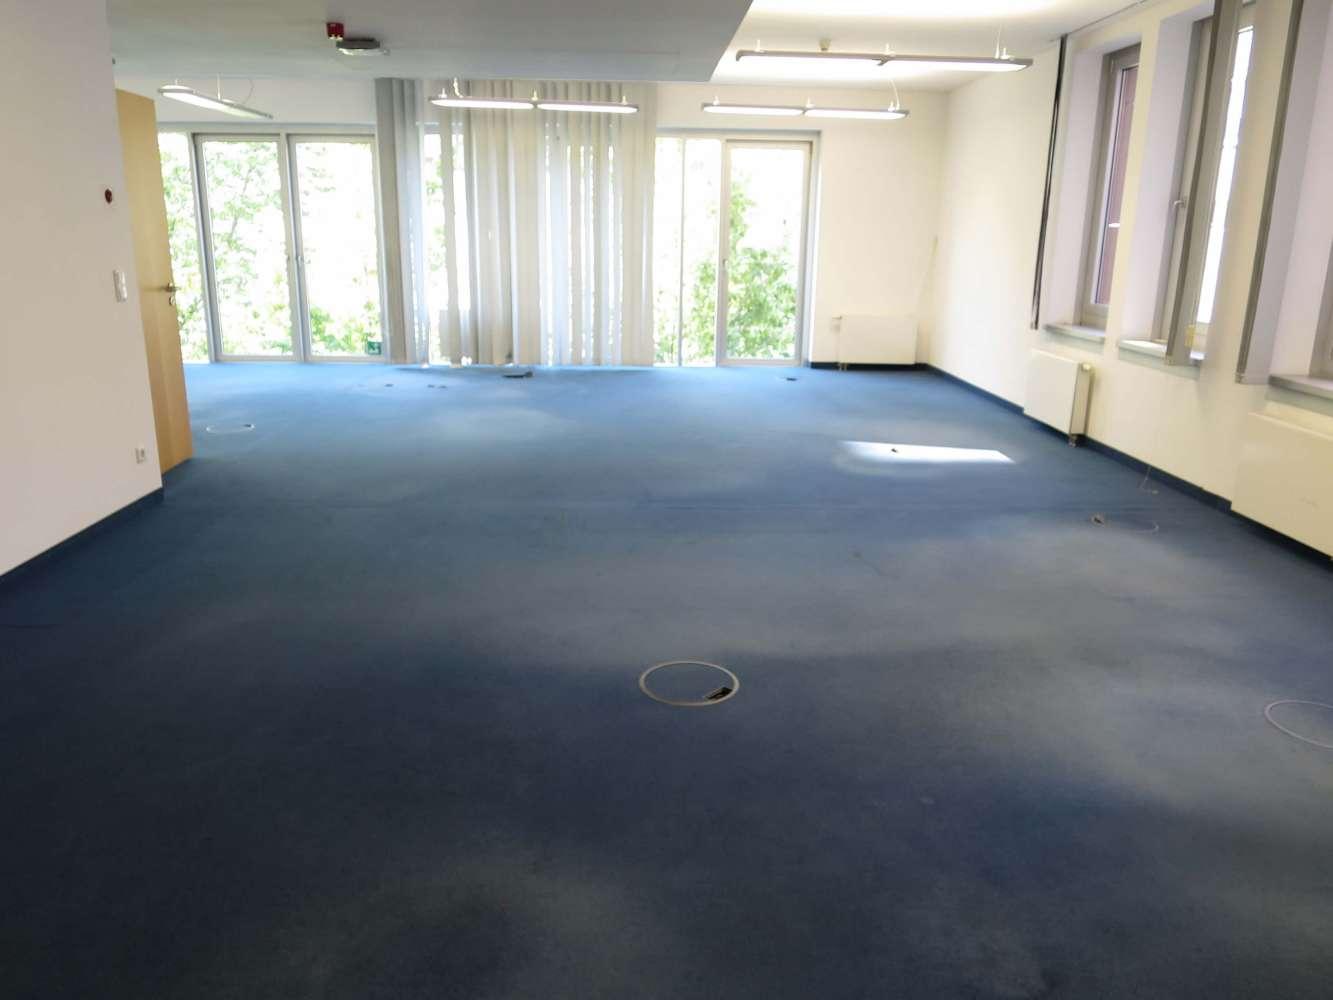 Büros Frankfurt am main, 60598 - Büro - Frankfurt am Main, Sachsenhausen - F2166 - 10641785